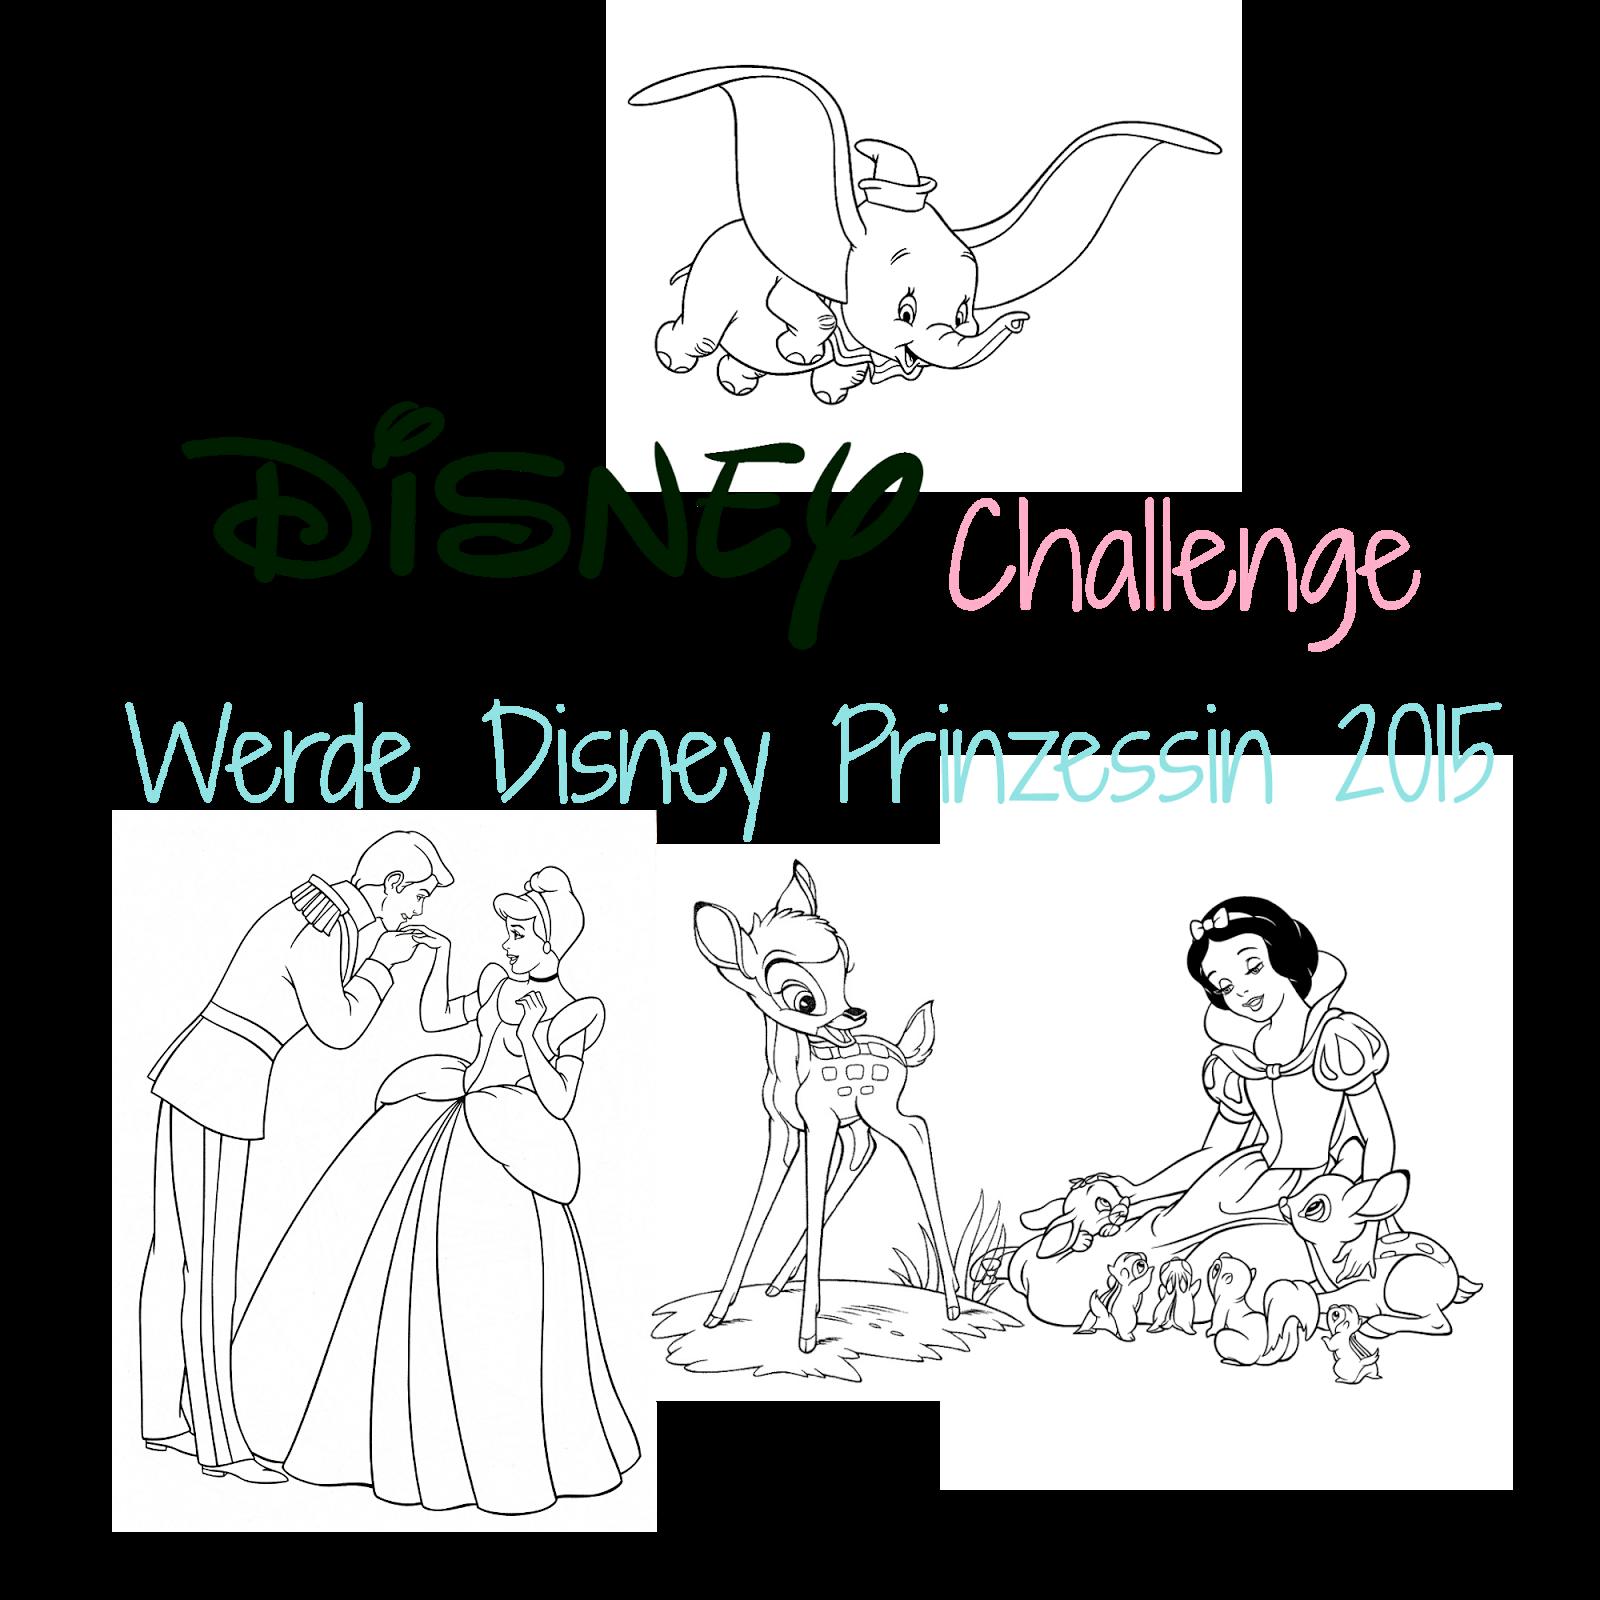 http://bowsandfairytales.blogspot.de/2015/01/anmeldung-disney-challenge-werde-disney.html